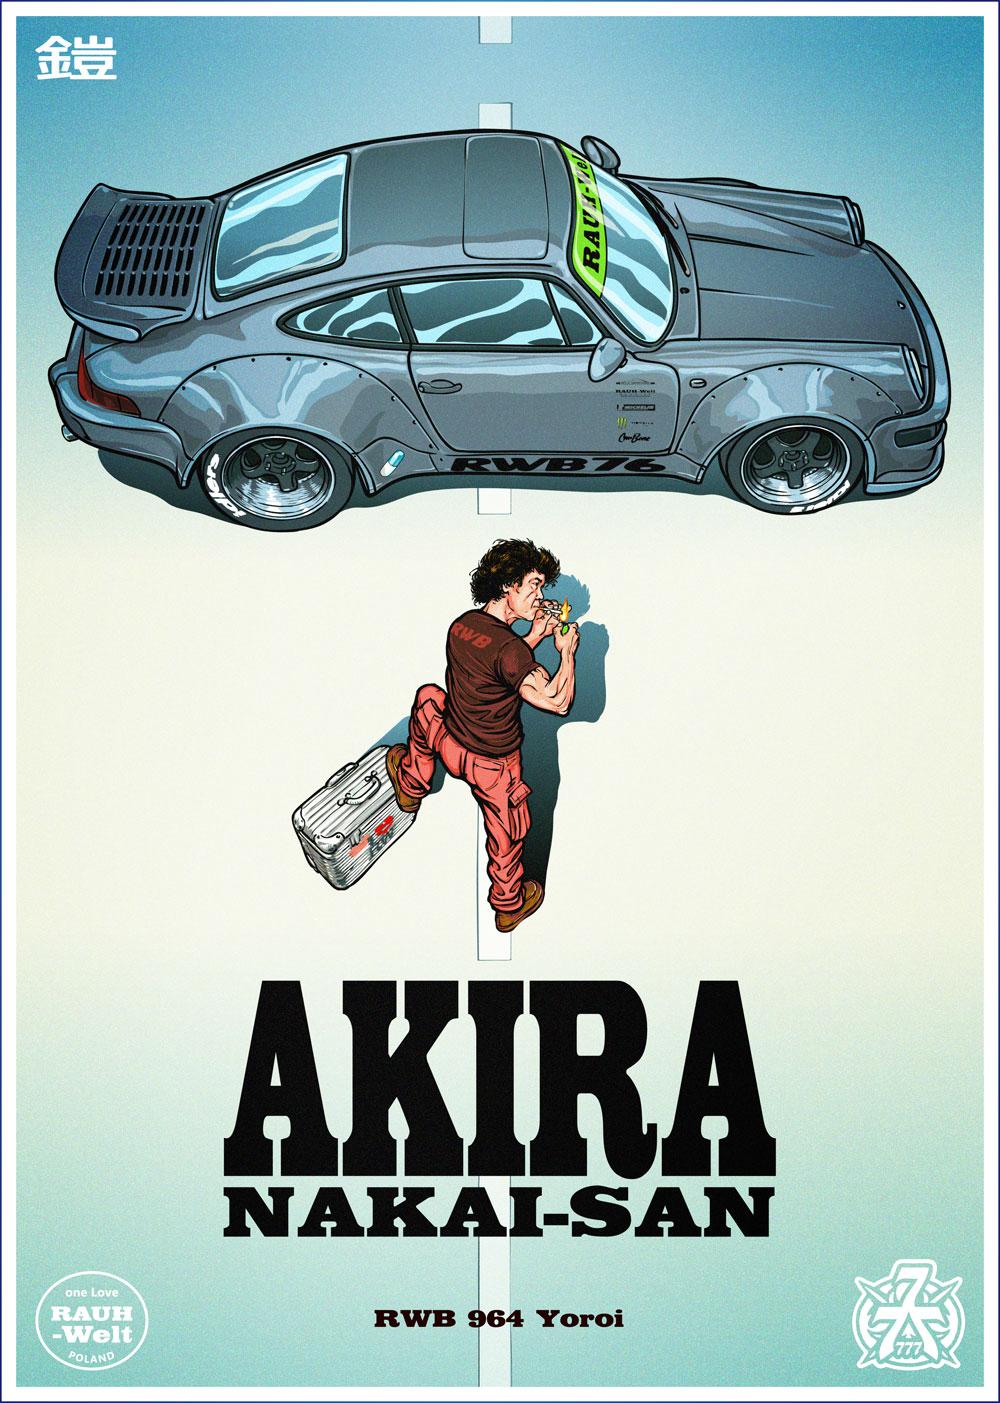 RAUH-Welt 964 Yoroi & Akira Nakai poster